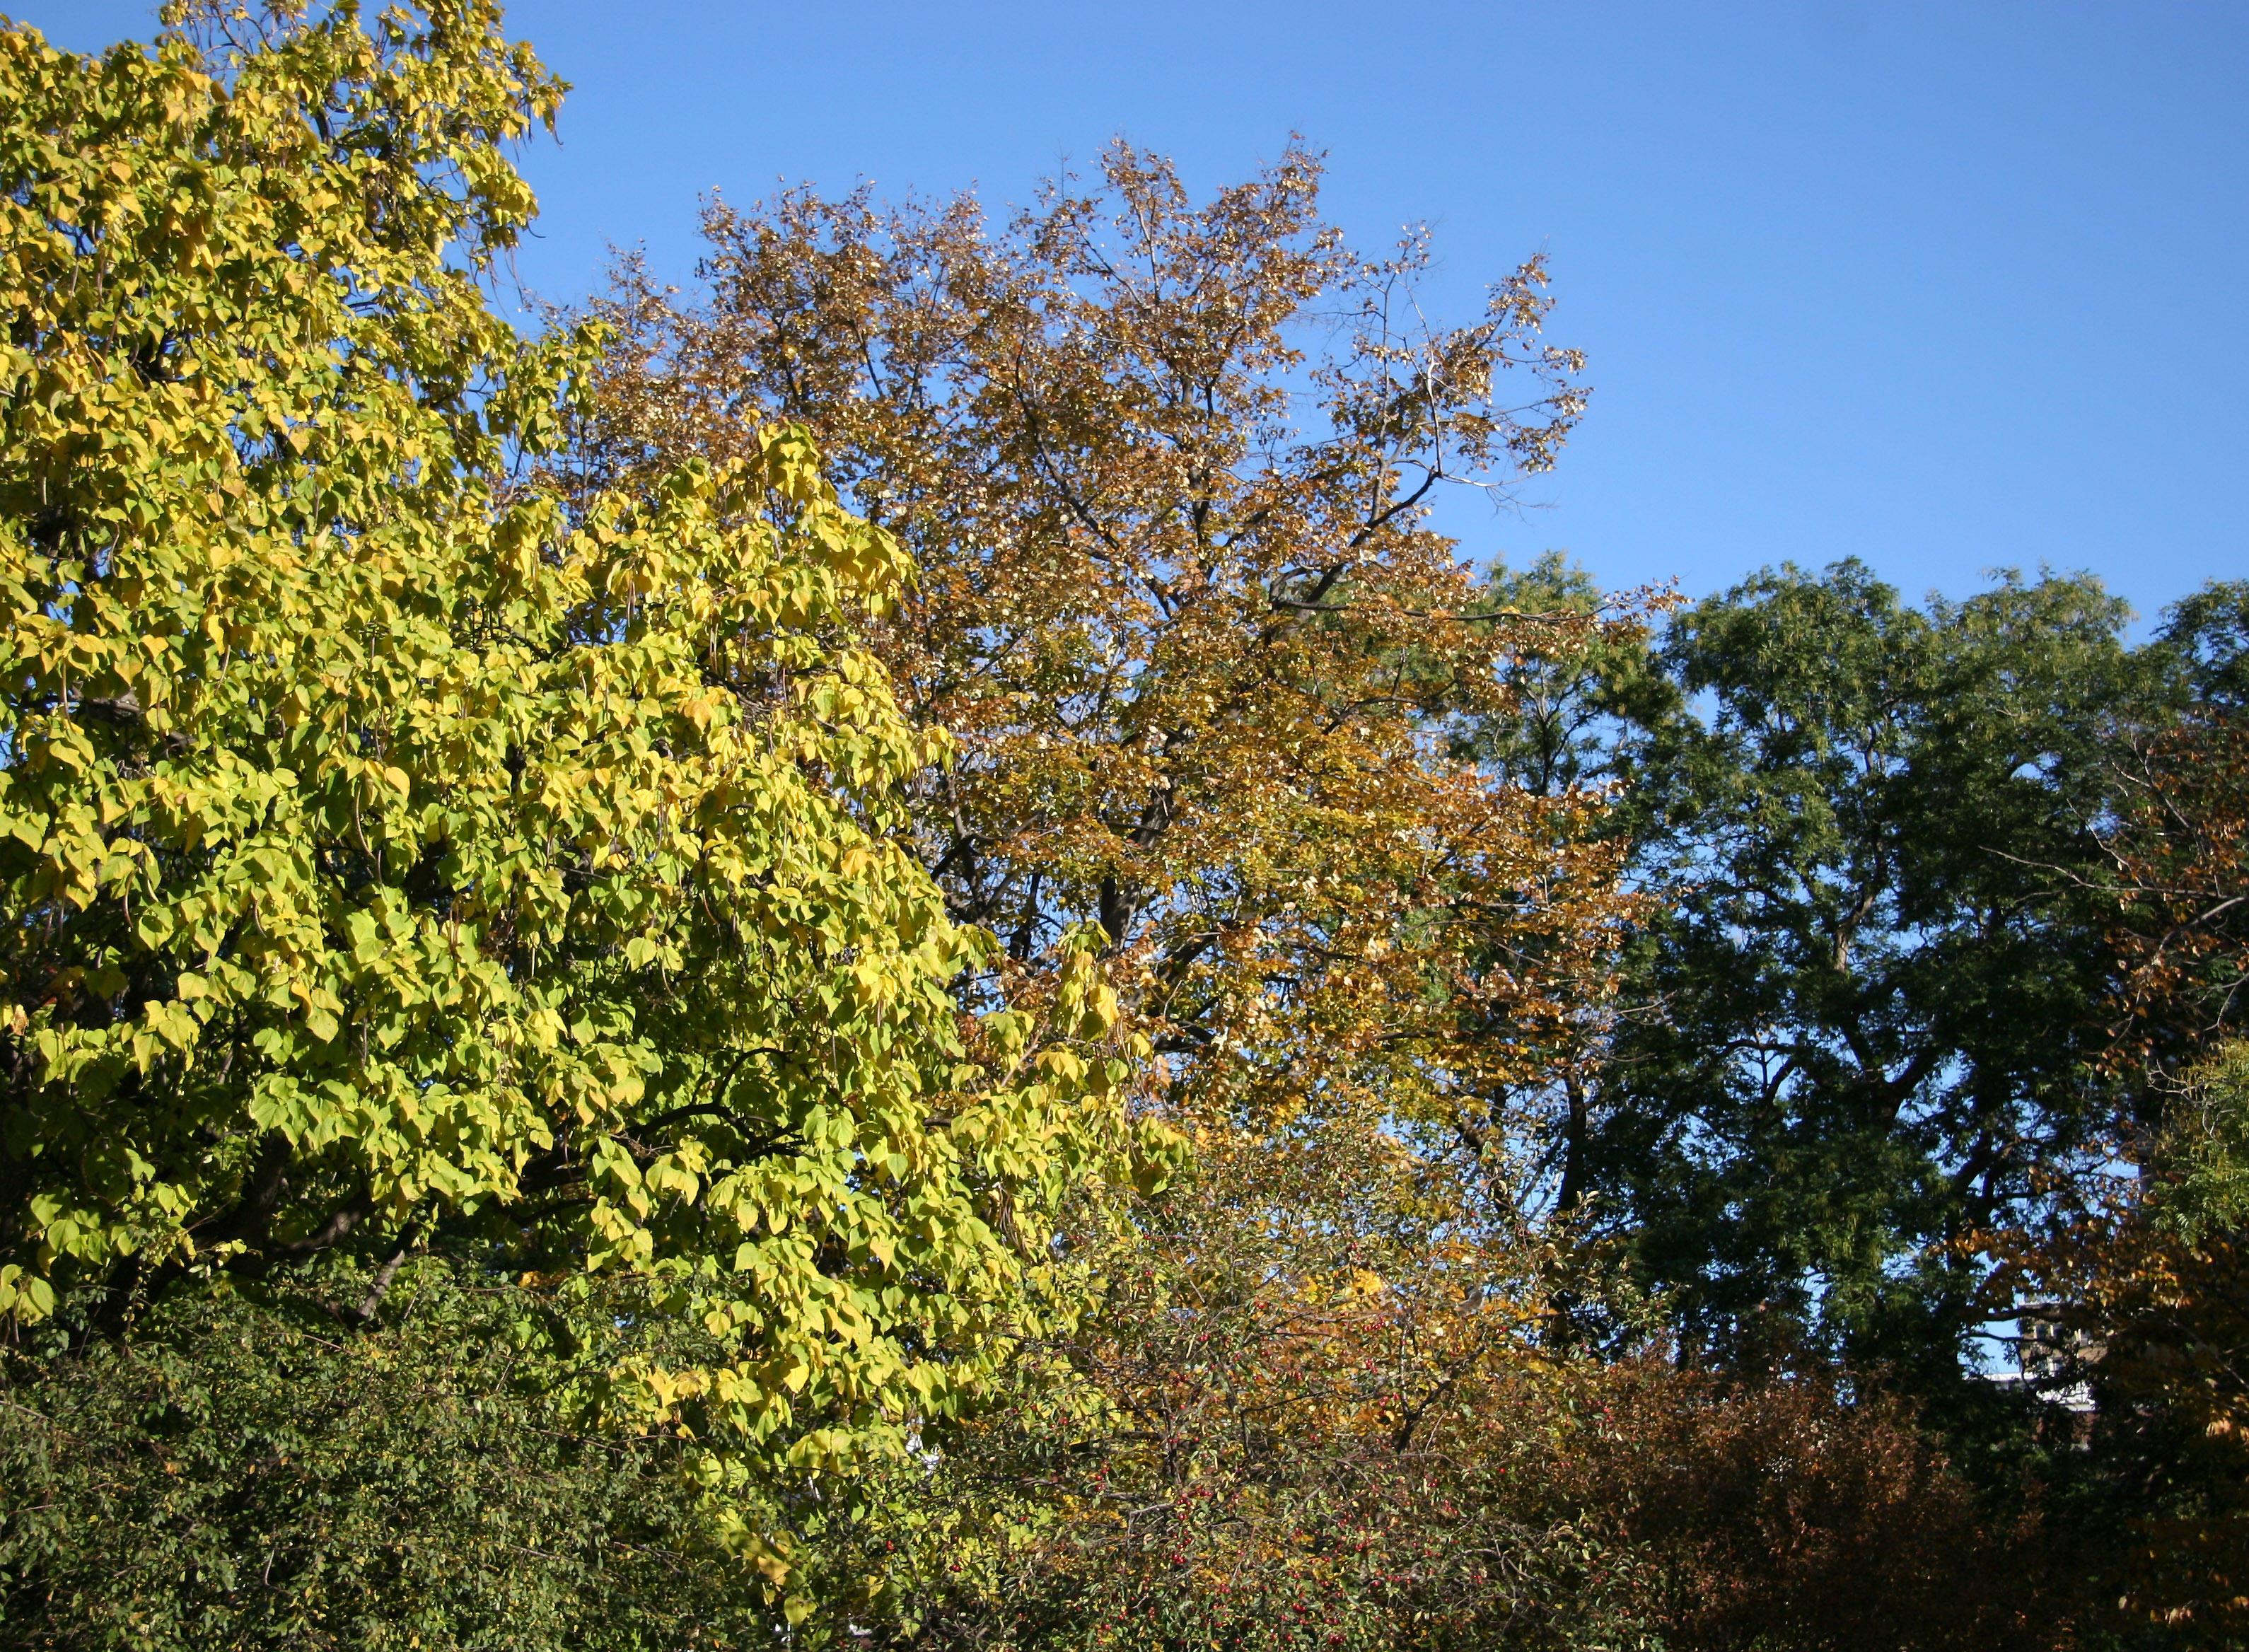 Catalpa, Oak & Linden Tree Foliage